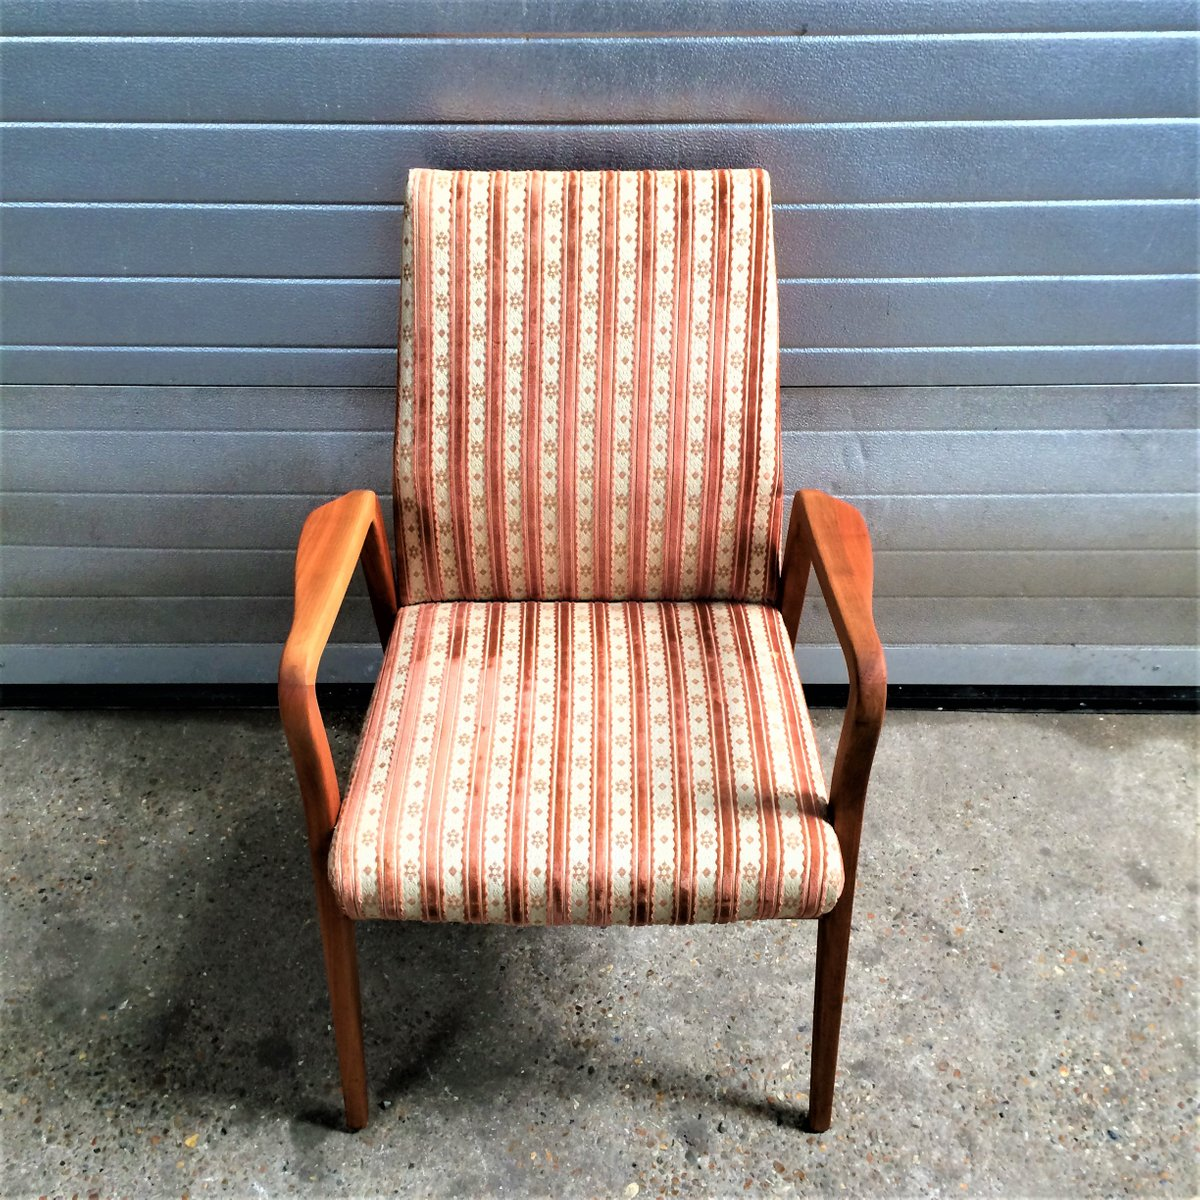 Vintage Scandinavian Armchair, 1960s For Sale At Pamono